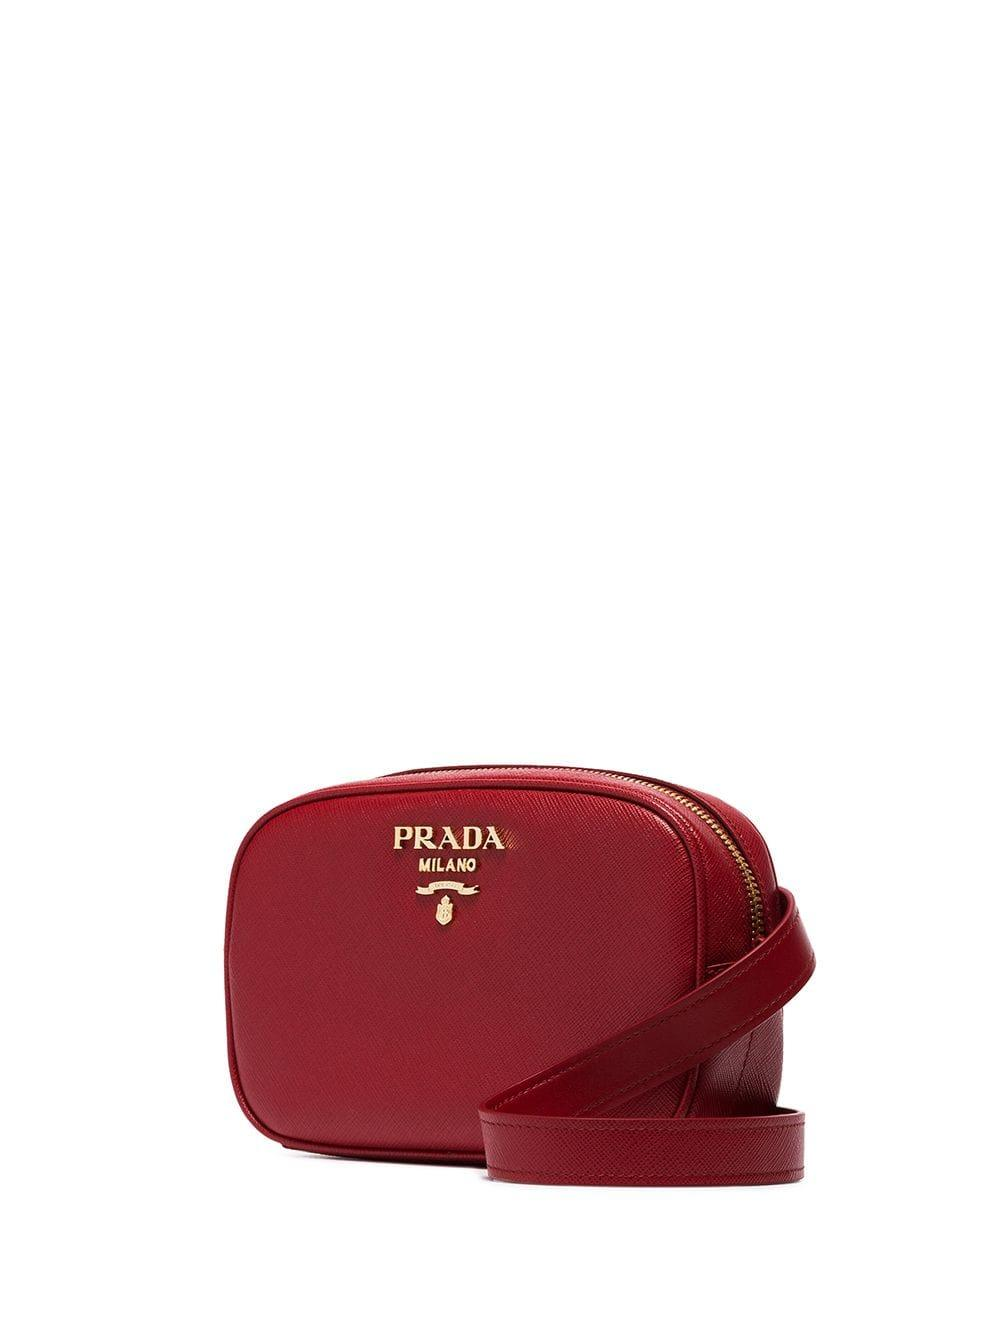 0db1a8e06287 Prada - Red Chain-detail Leather Belt Bag - Lyst. View fullscreen